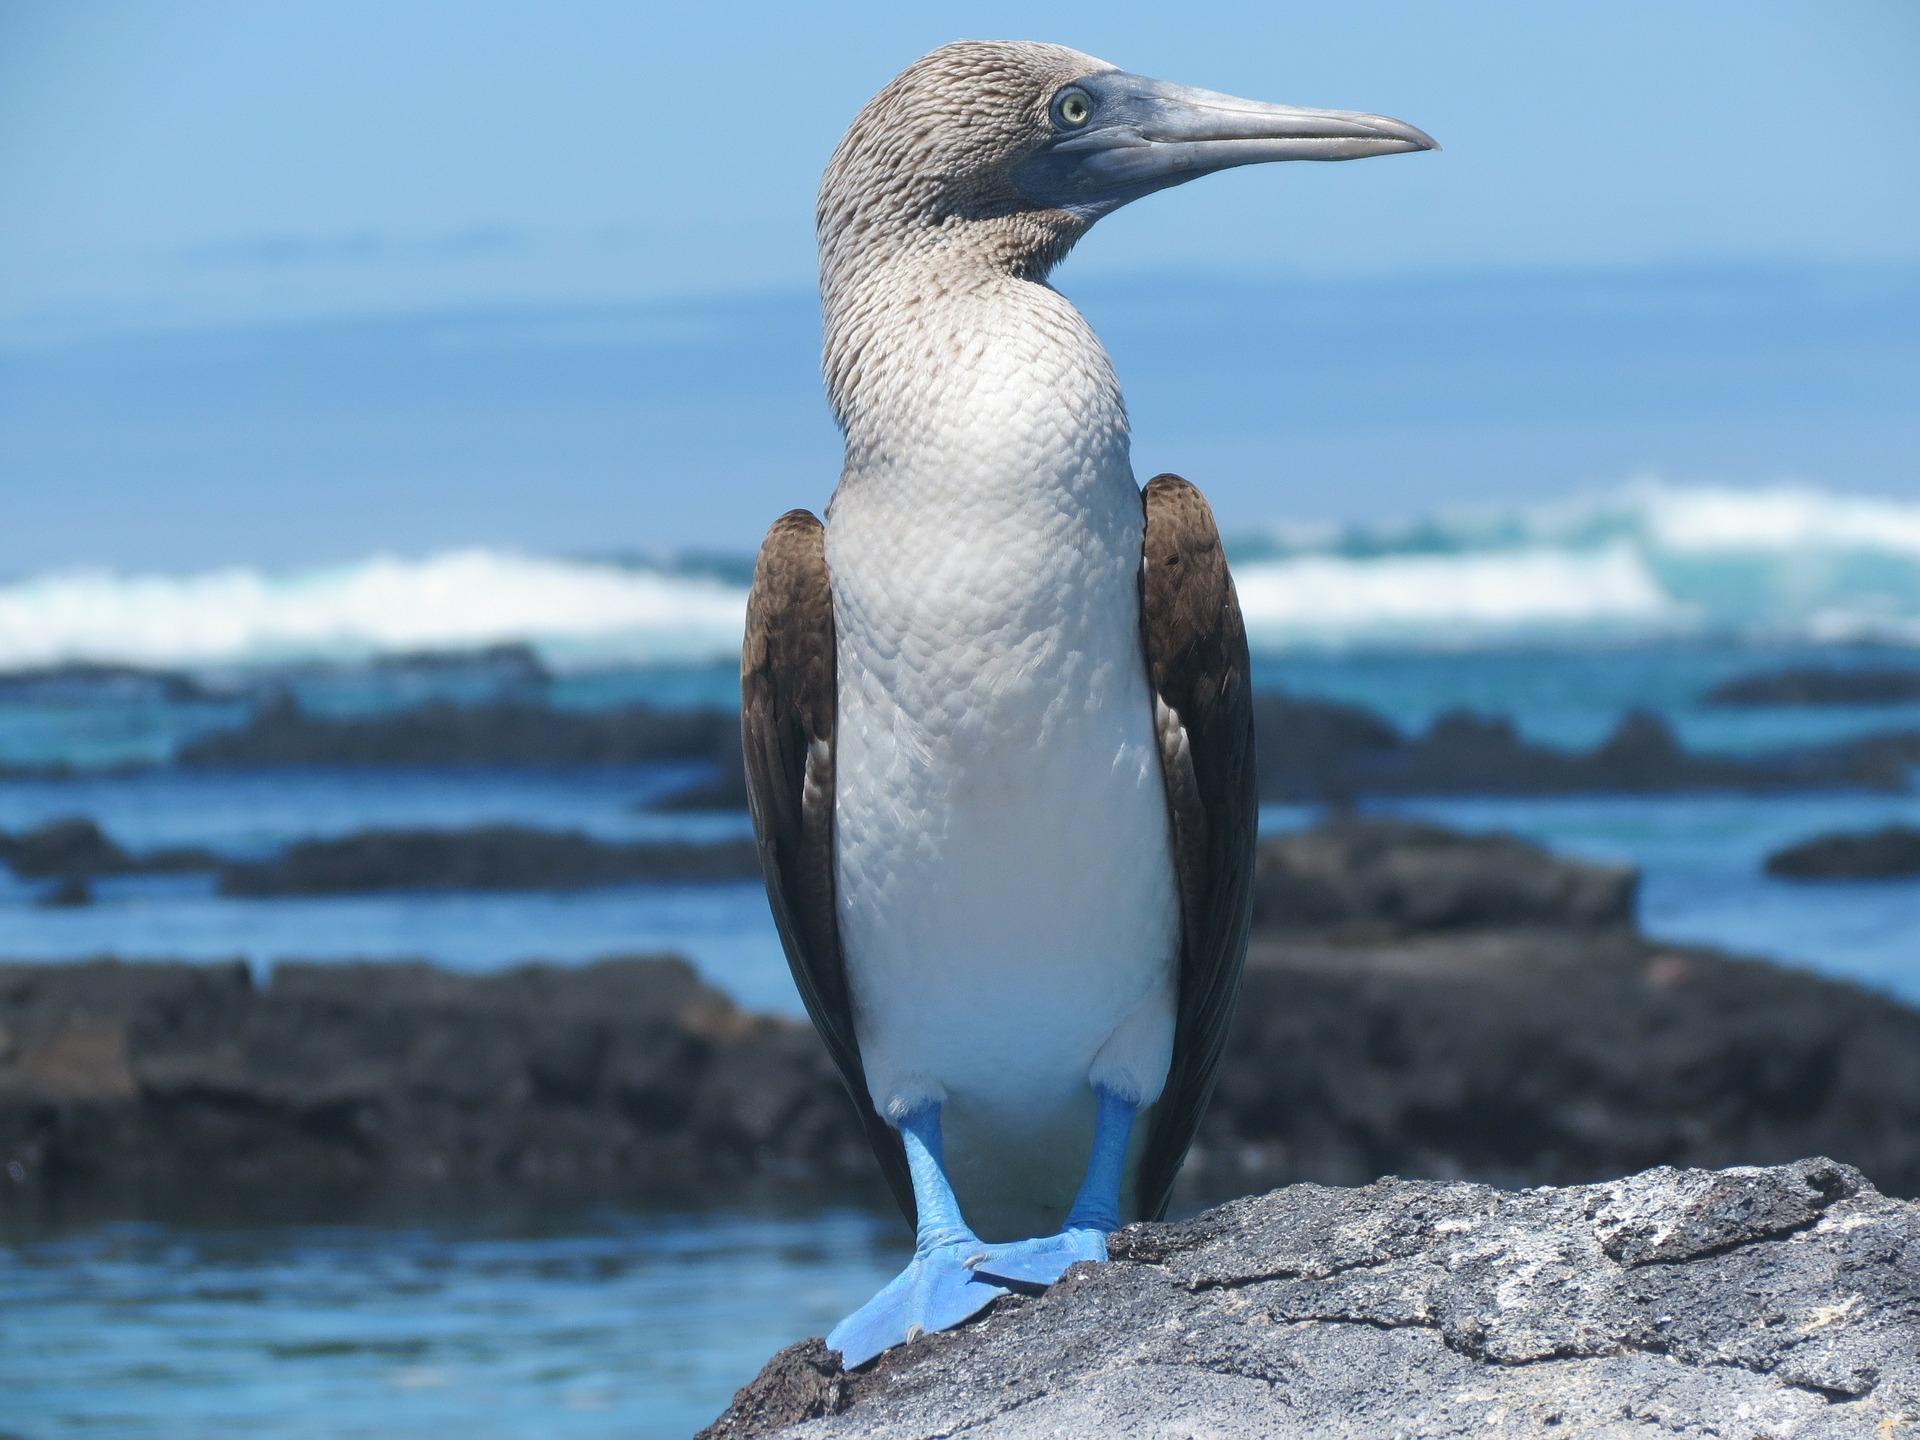 Flüge: München (MUC) -> Galapagos/Ecuador (GPS) im November/Dezember (Hin- und Zurück) ab 630€ inkl. Gepäck